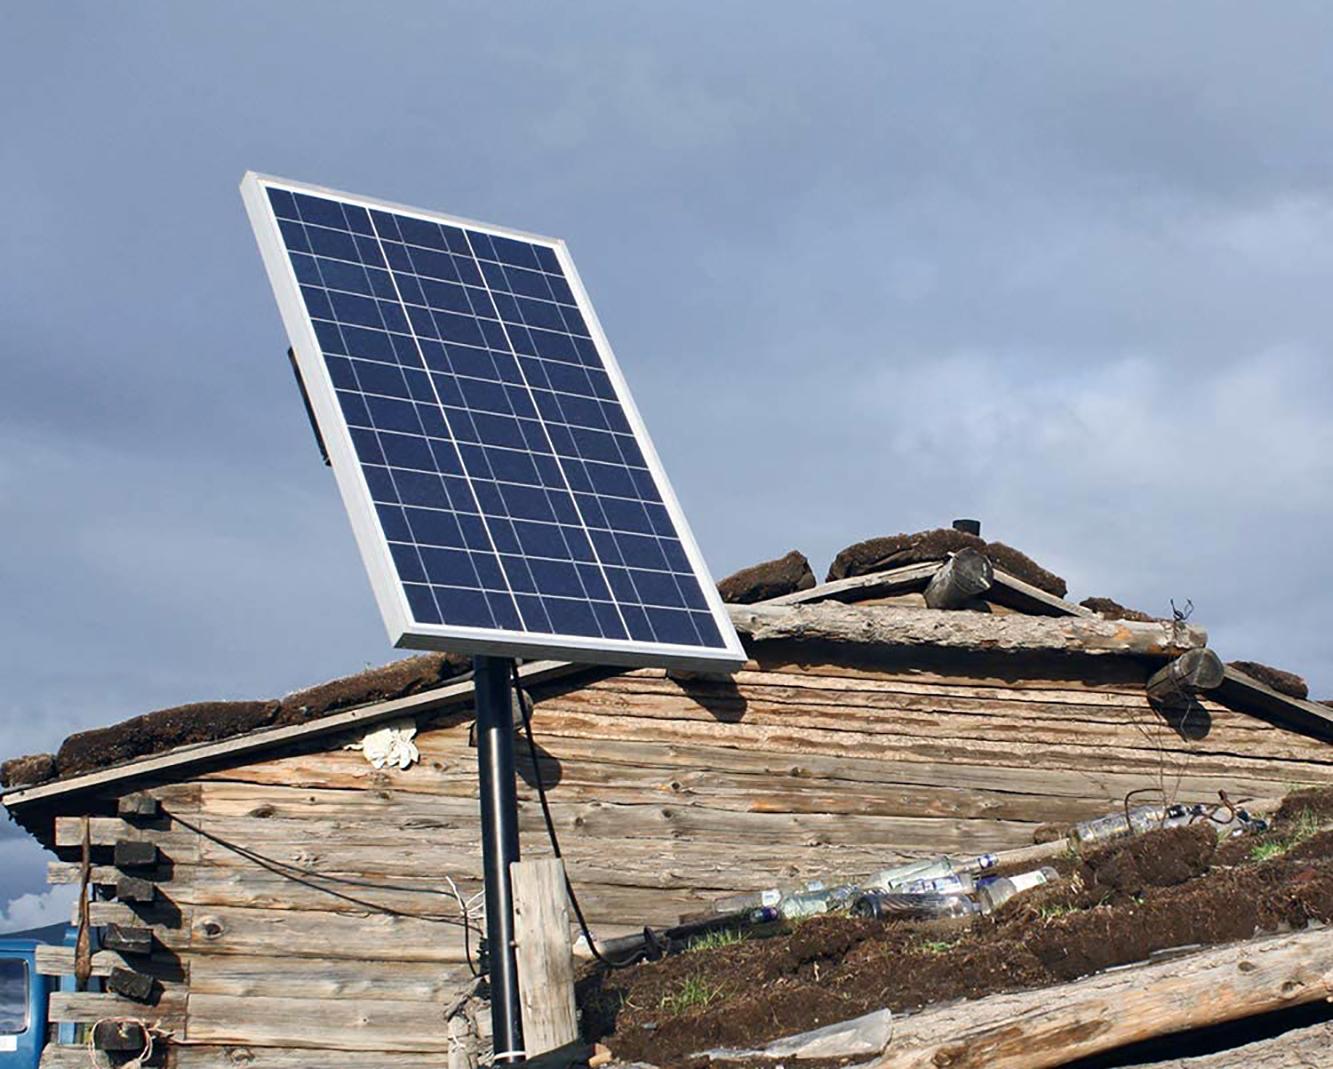 Waterproof 25W Solar Panel review